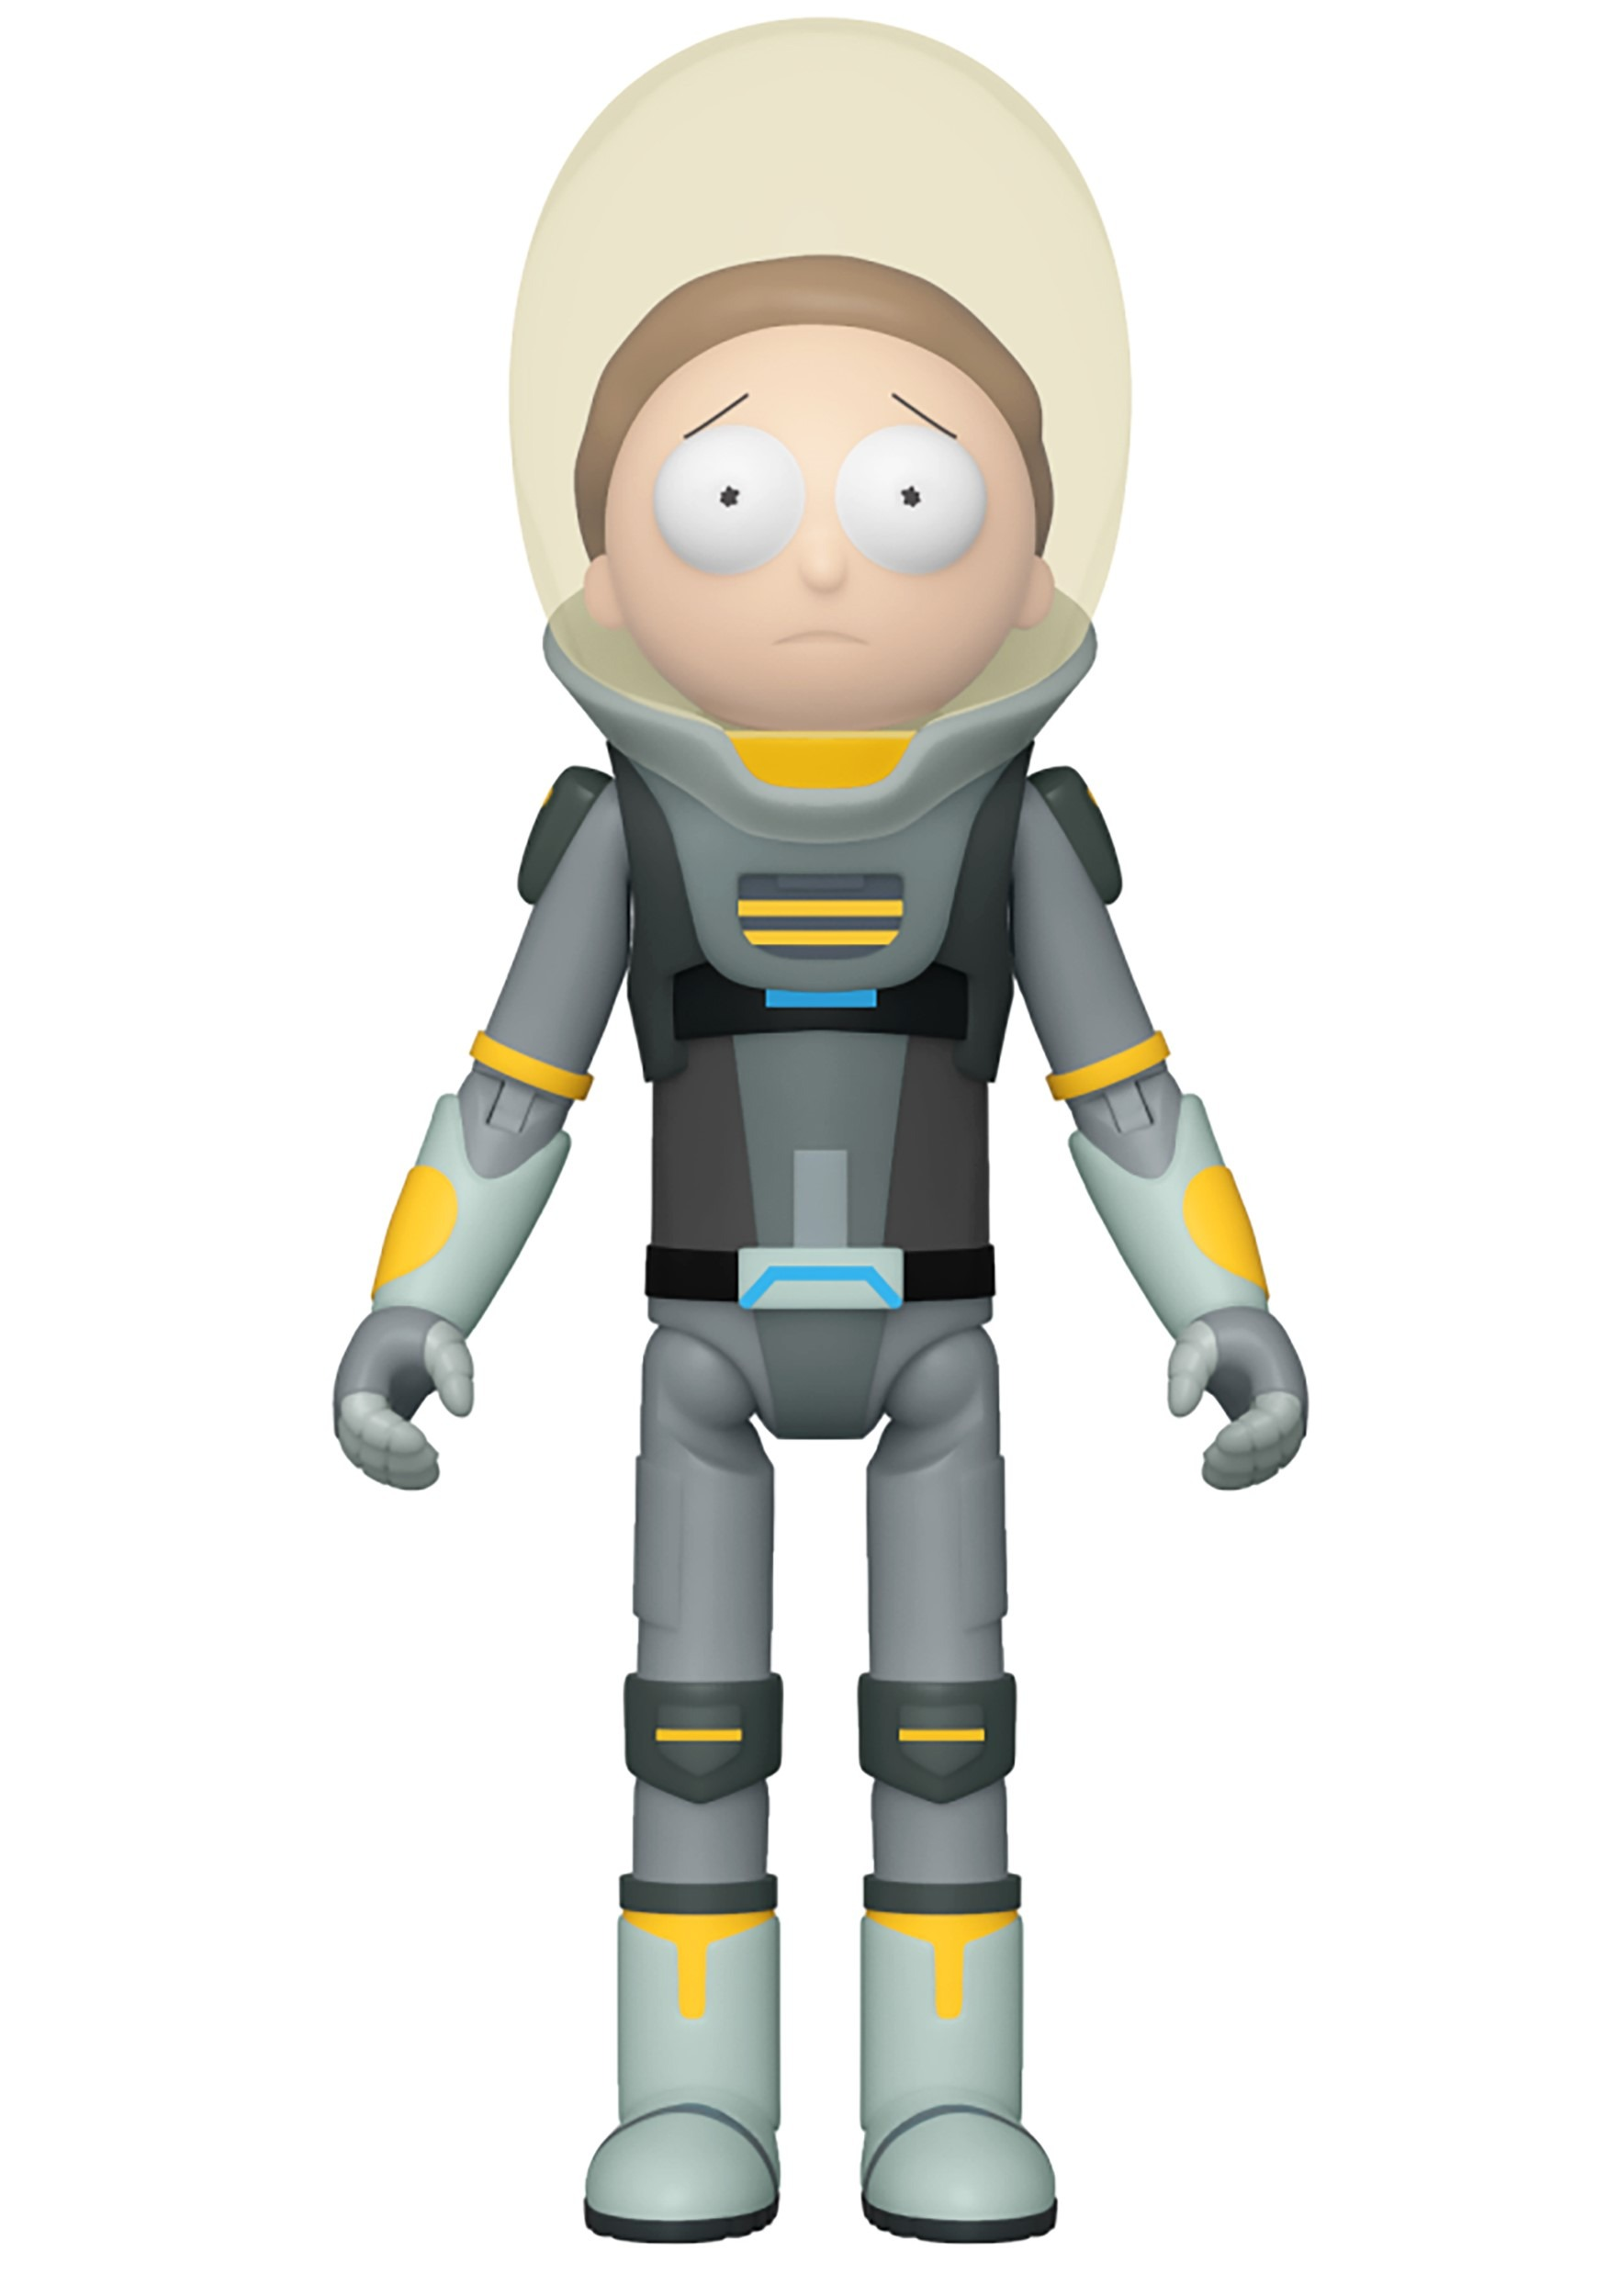 Action Figure: Space Suit Morty - Rick & Morty